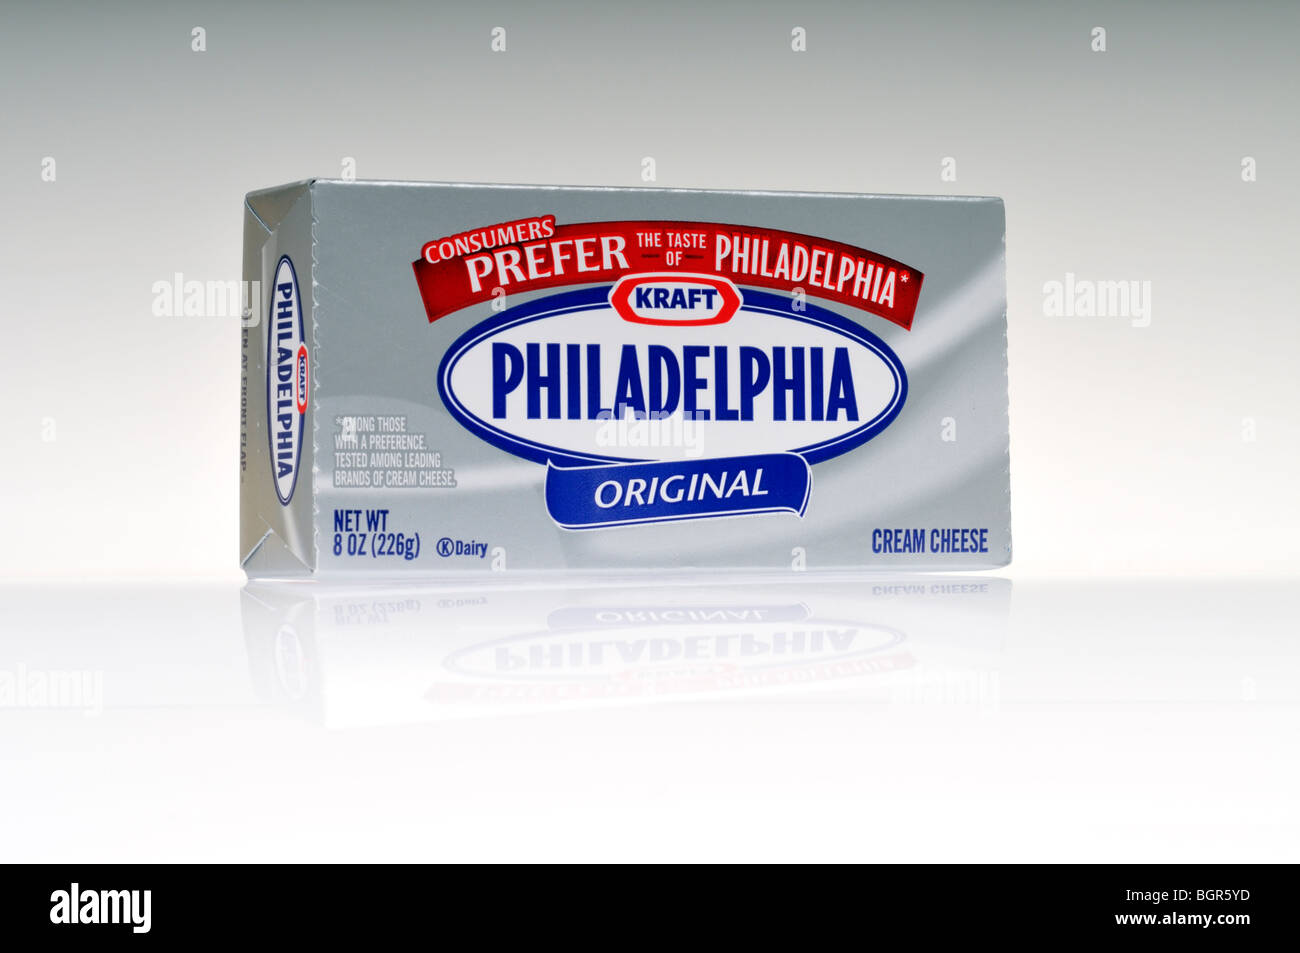 A package of Kraft Foods Philadelphia Cream Cheese - Stock Image